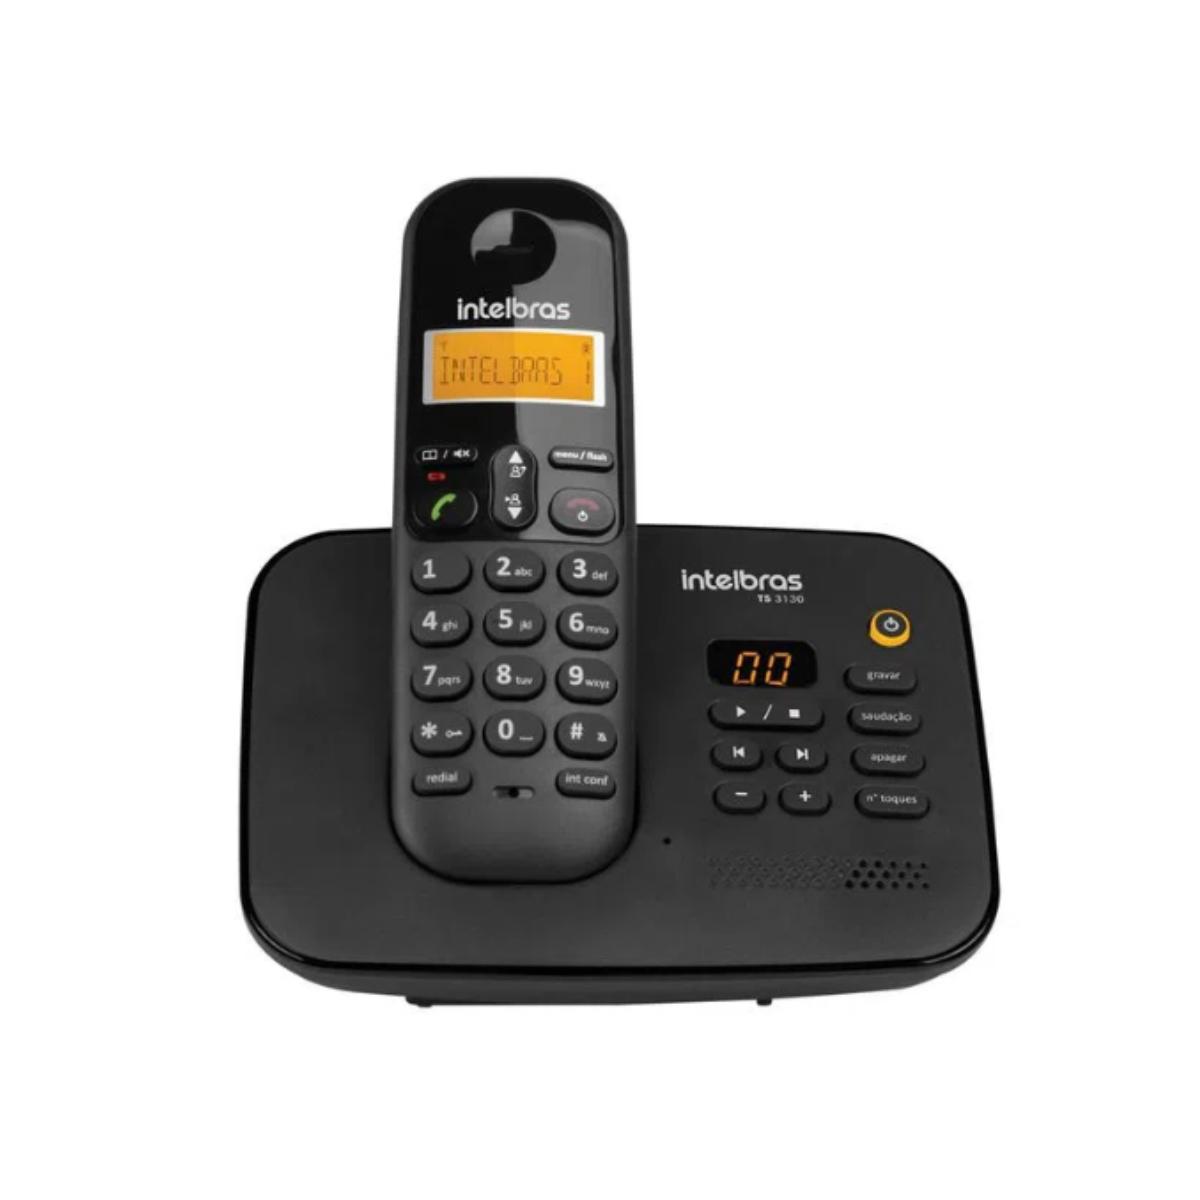 KIT TELEFONE INTELBRAS SEM FIO TS 3130 + 03 RAMAL TS 3111 PRETO